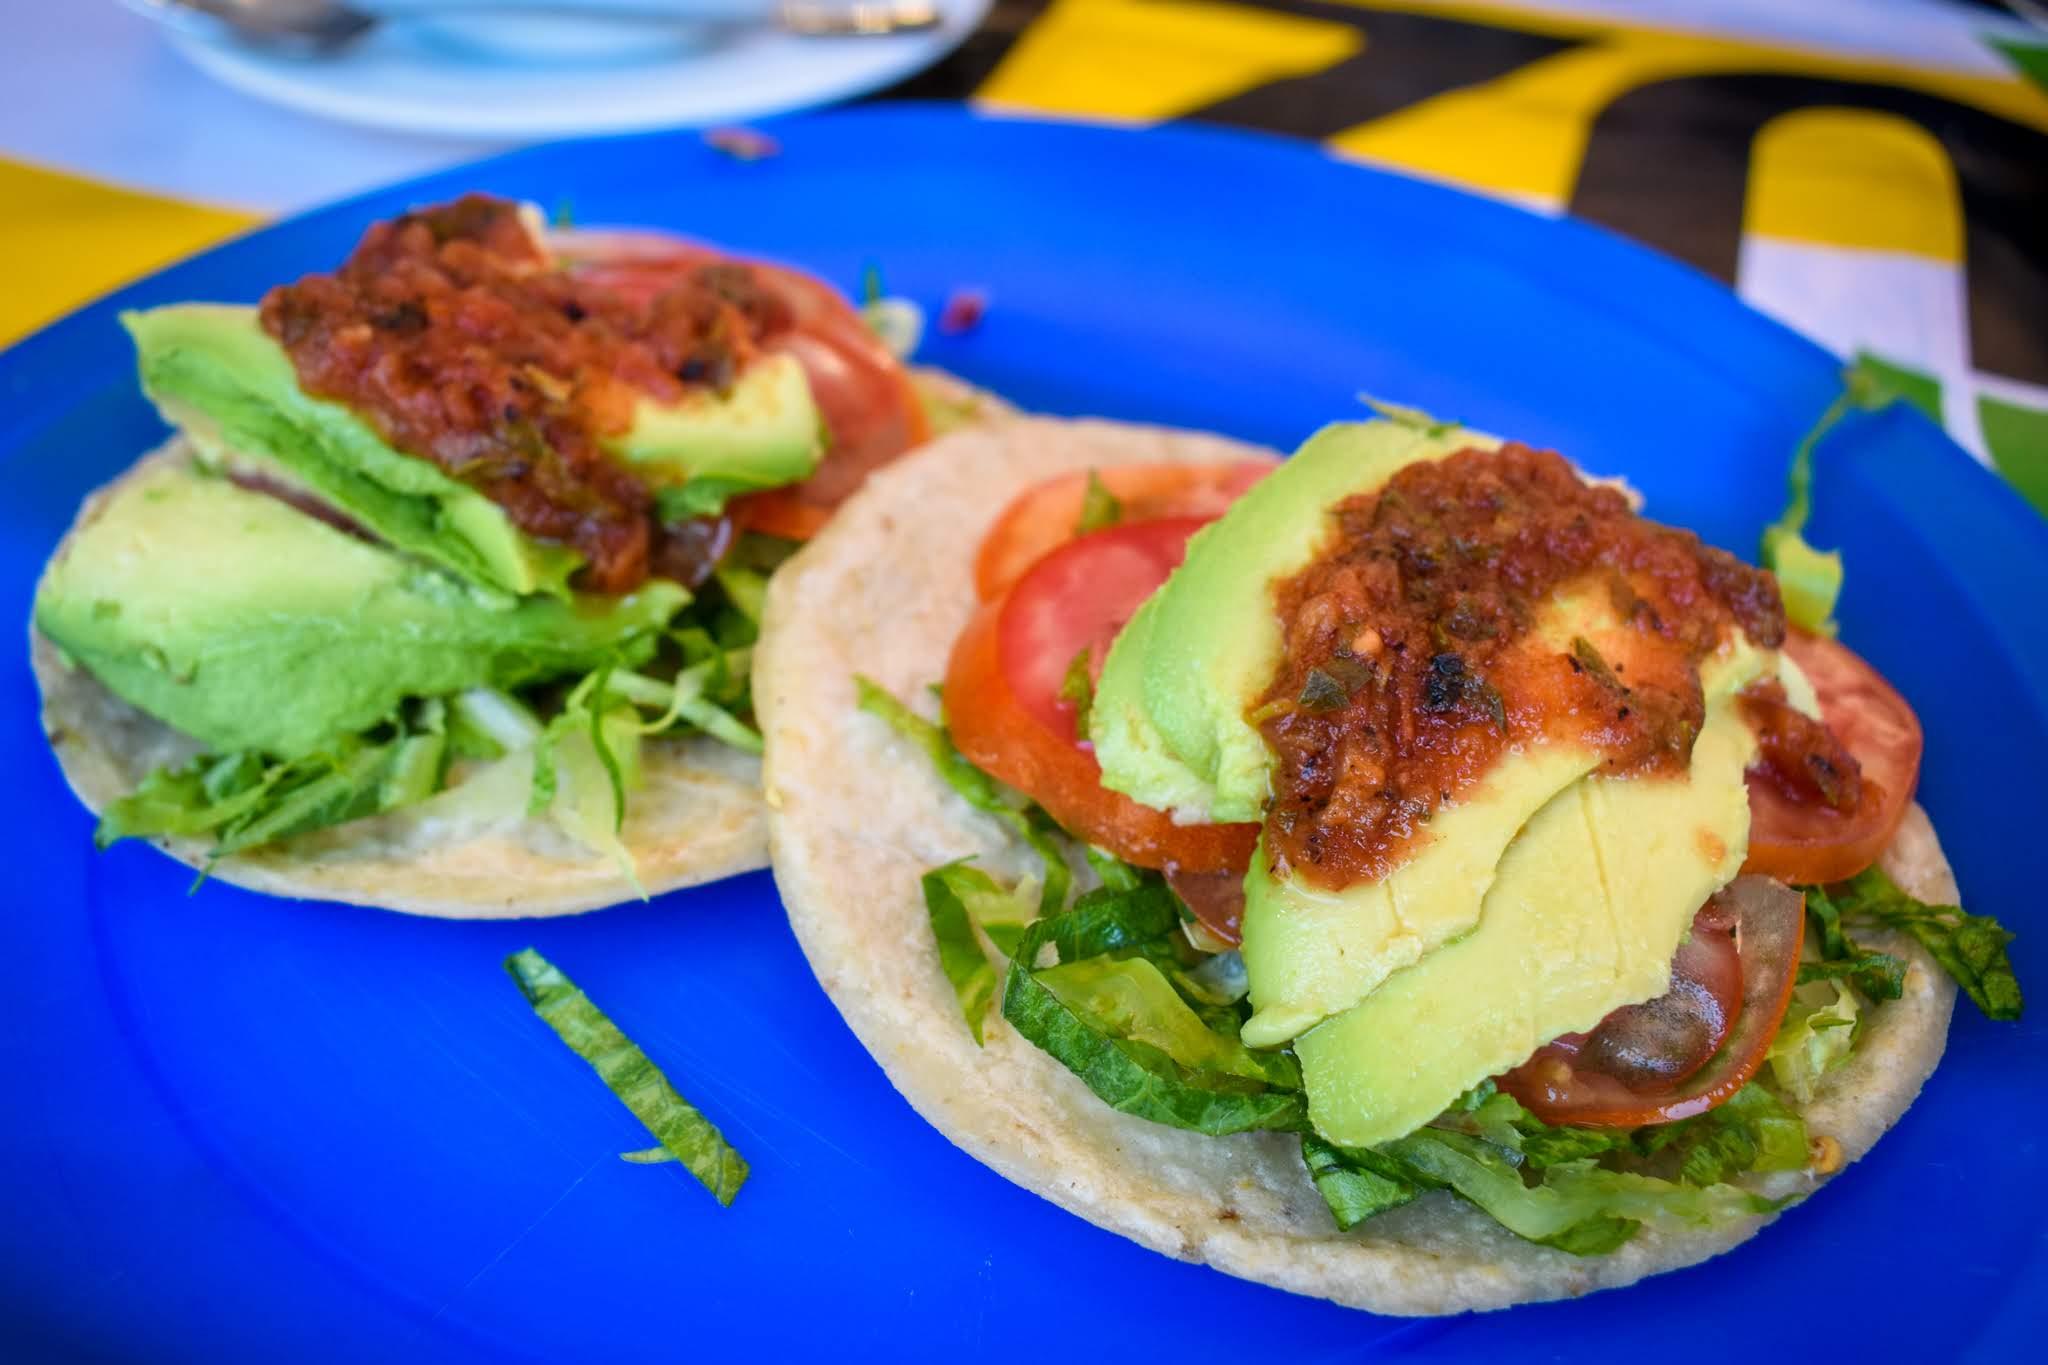 Uprooted-Traveler-Vegan-Weekend-in-Tulum-Mexico-Taqueria-Honorio-avocado-tacos.jpg